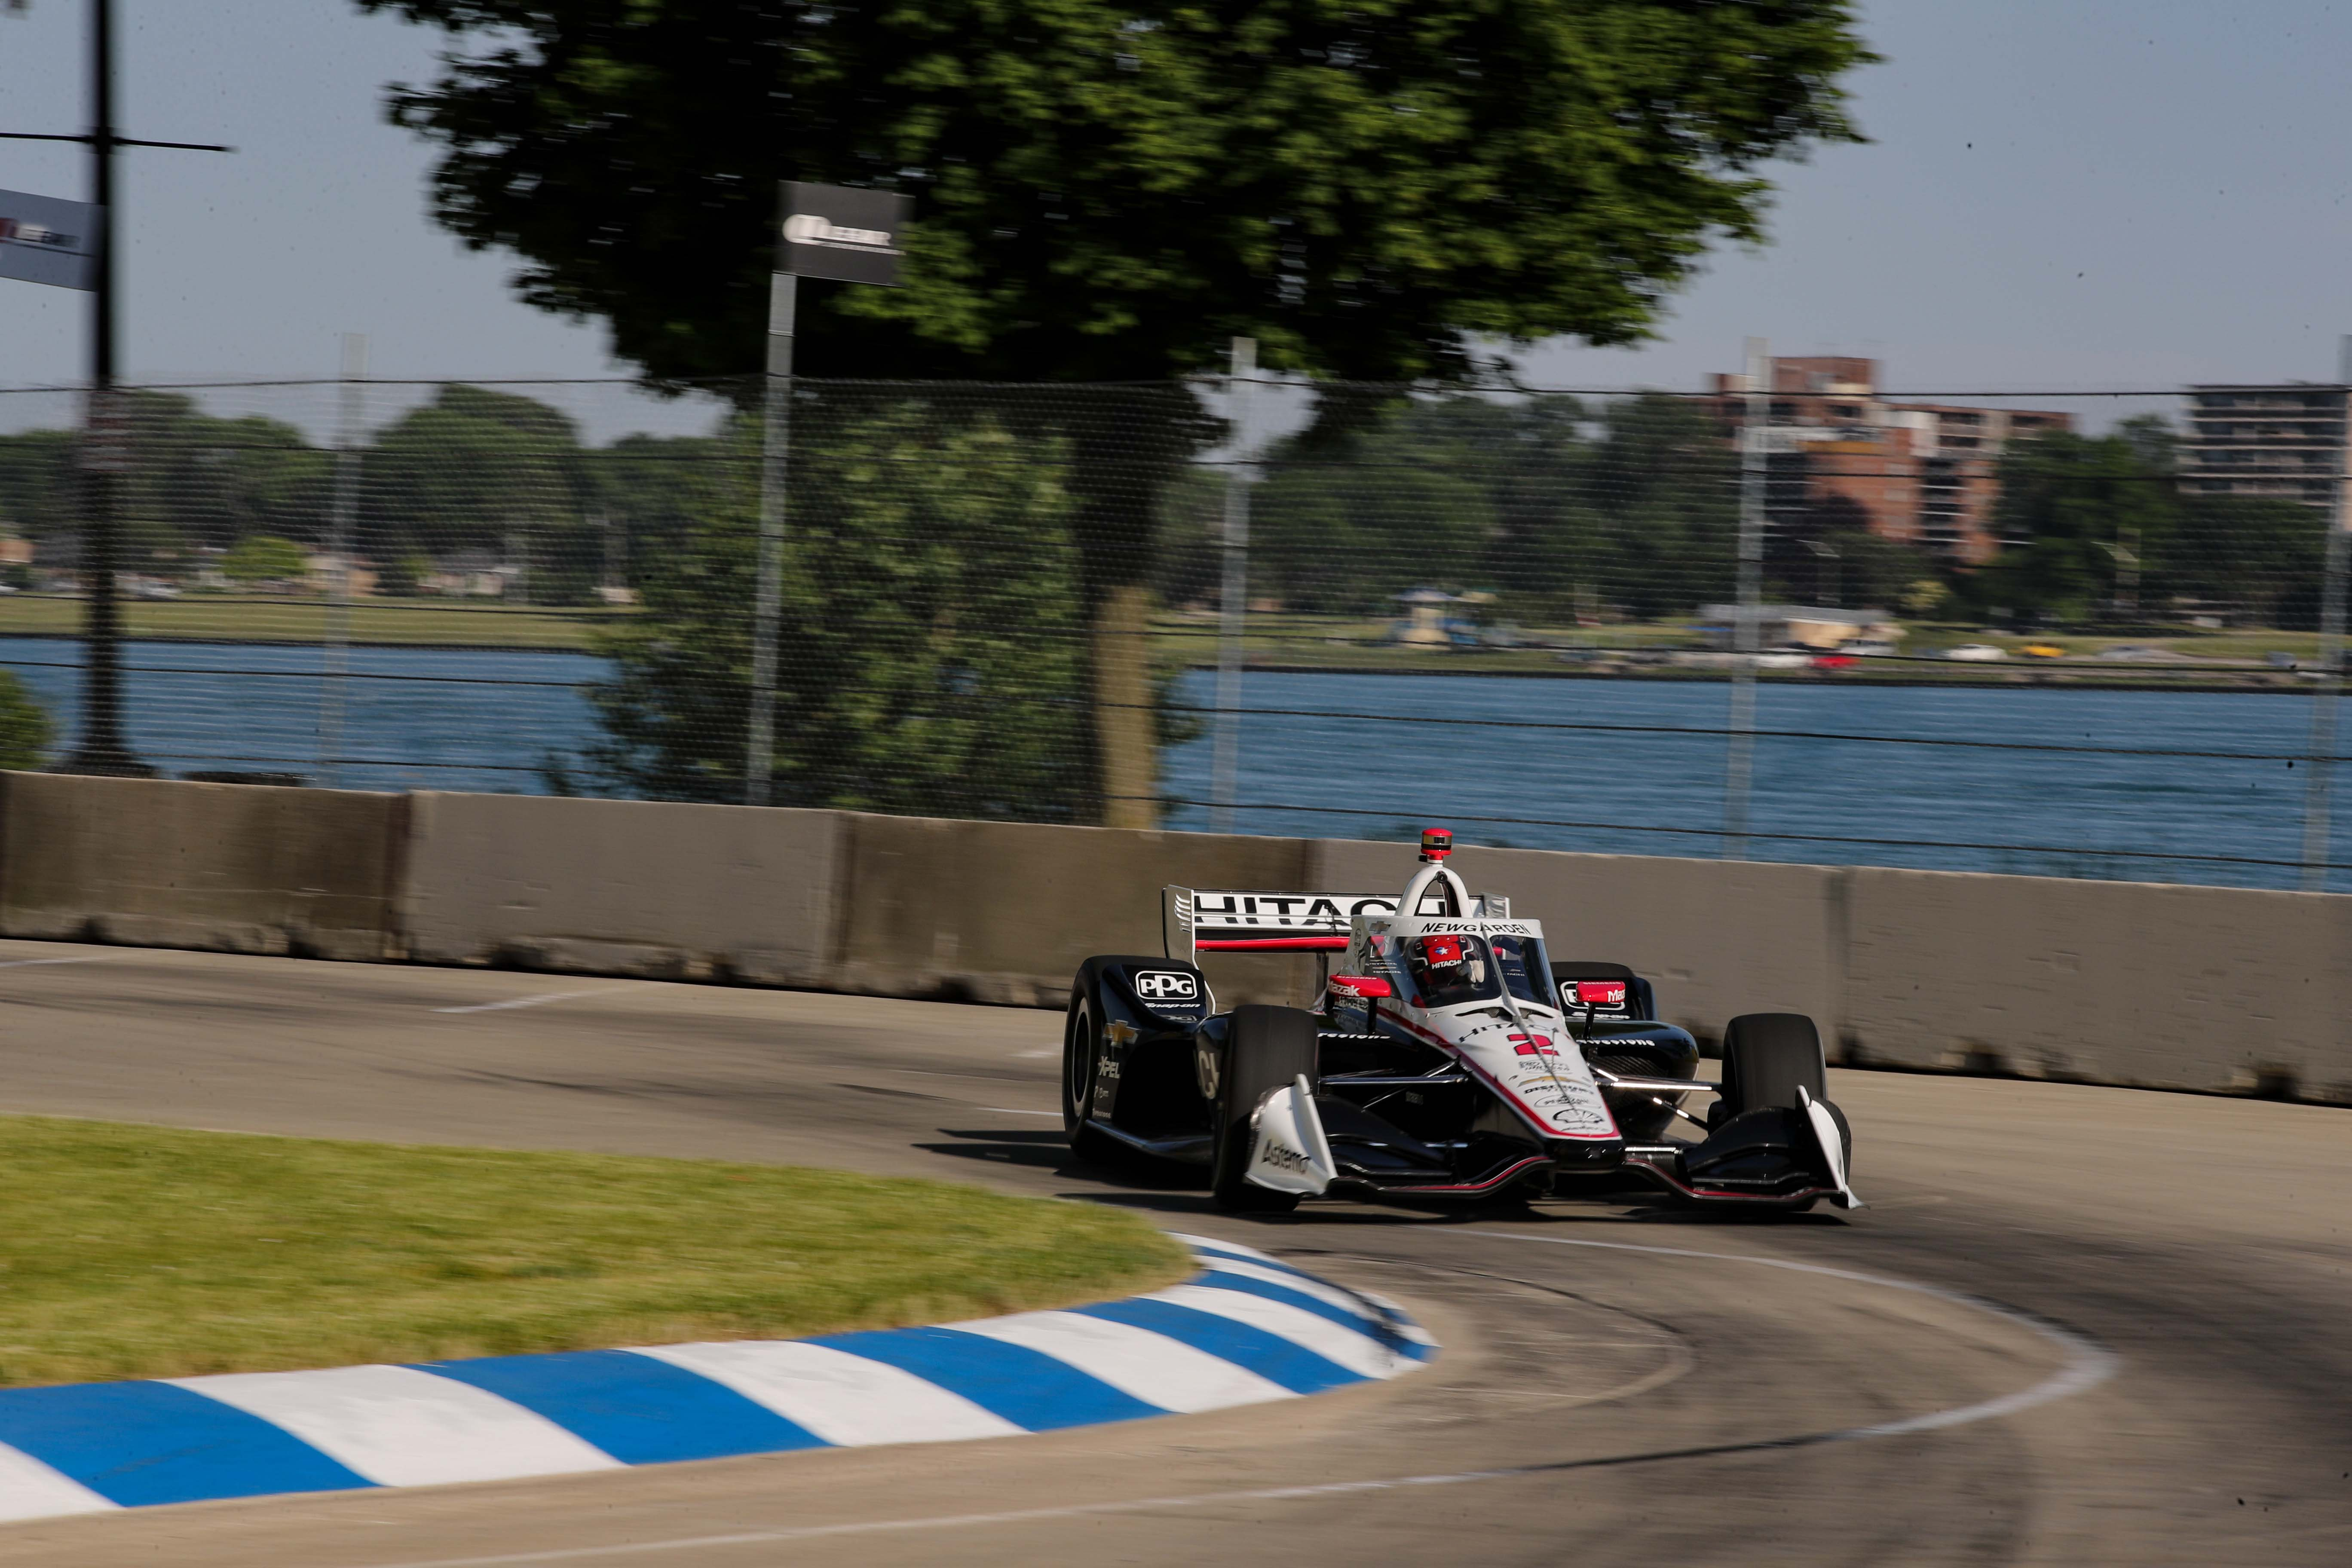 Josef Newgarden 2 - Detroit Grand Prix - Belle Isle Park - Indycar Series